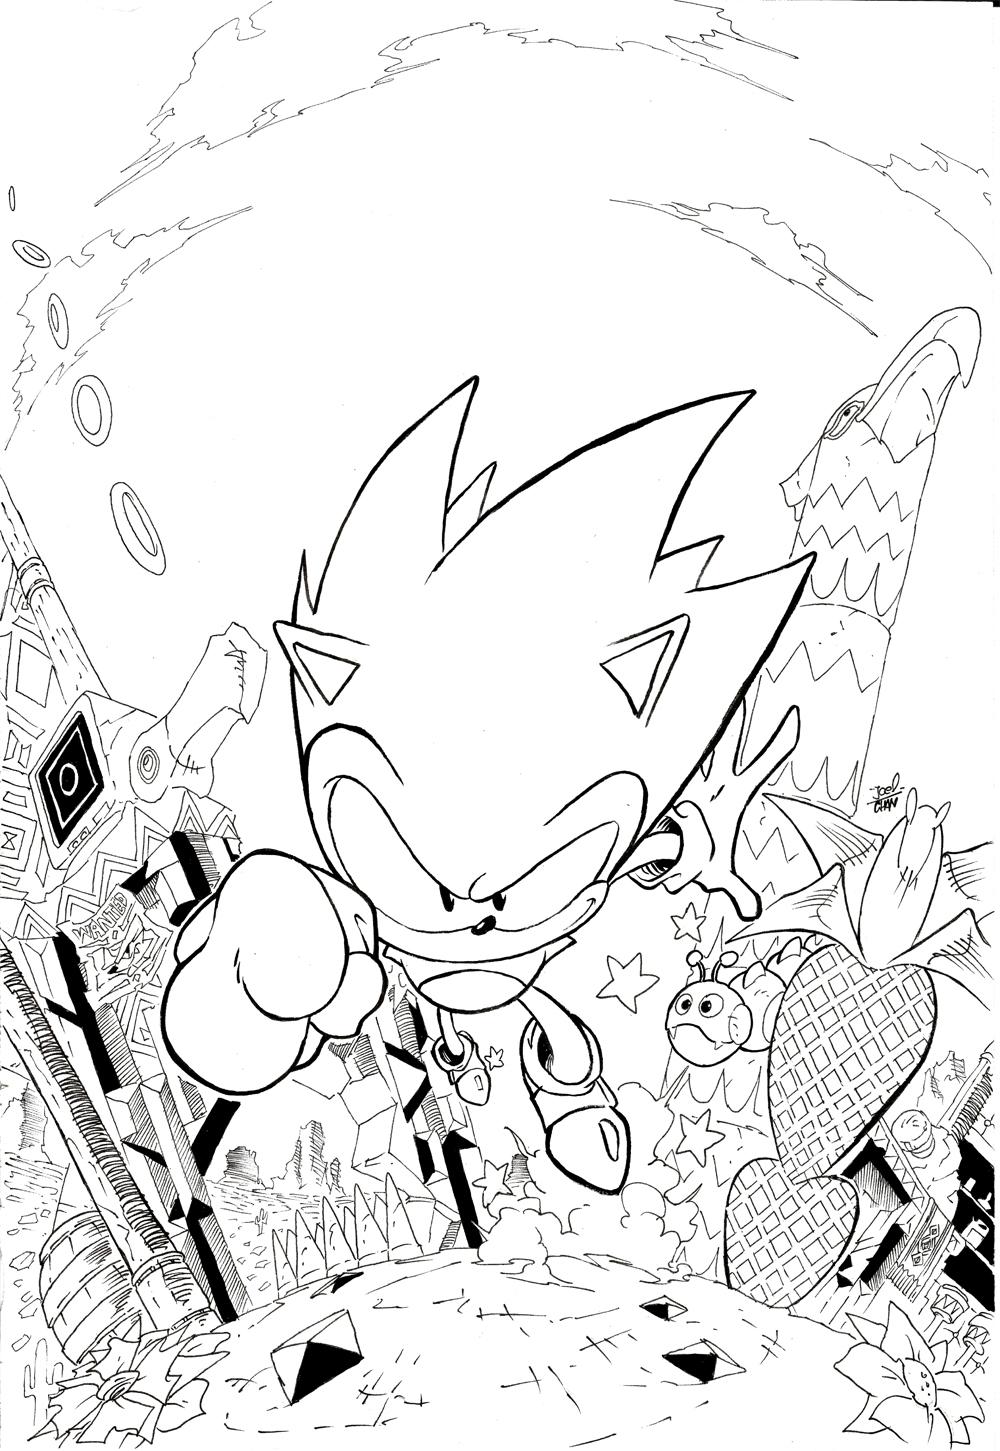 Sonic Mania mirage saloon inks by Joelchan on DeviantArt